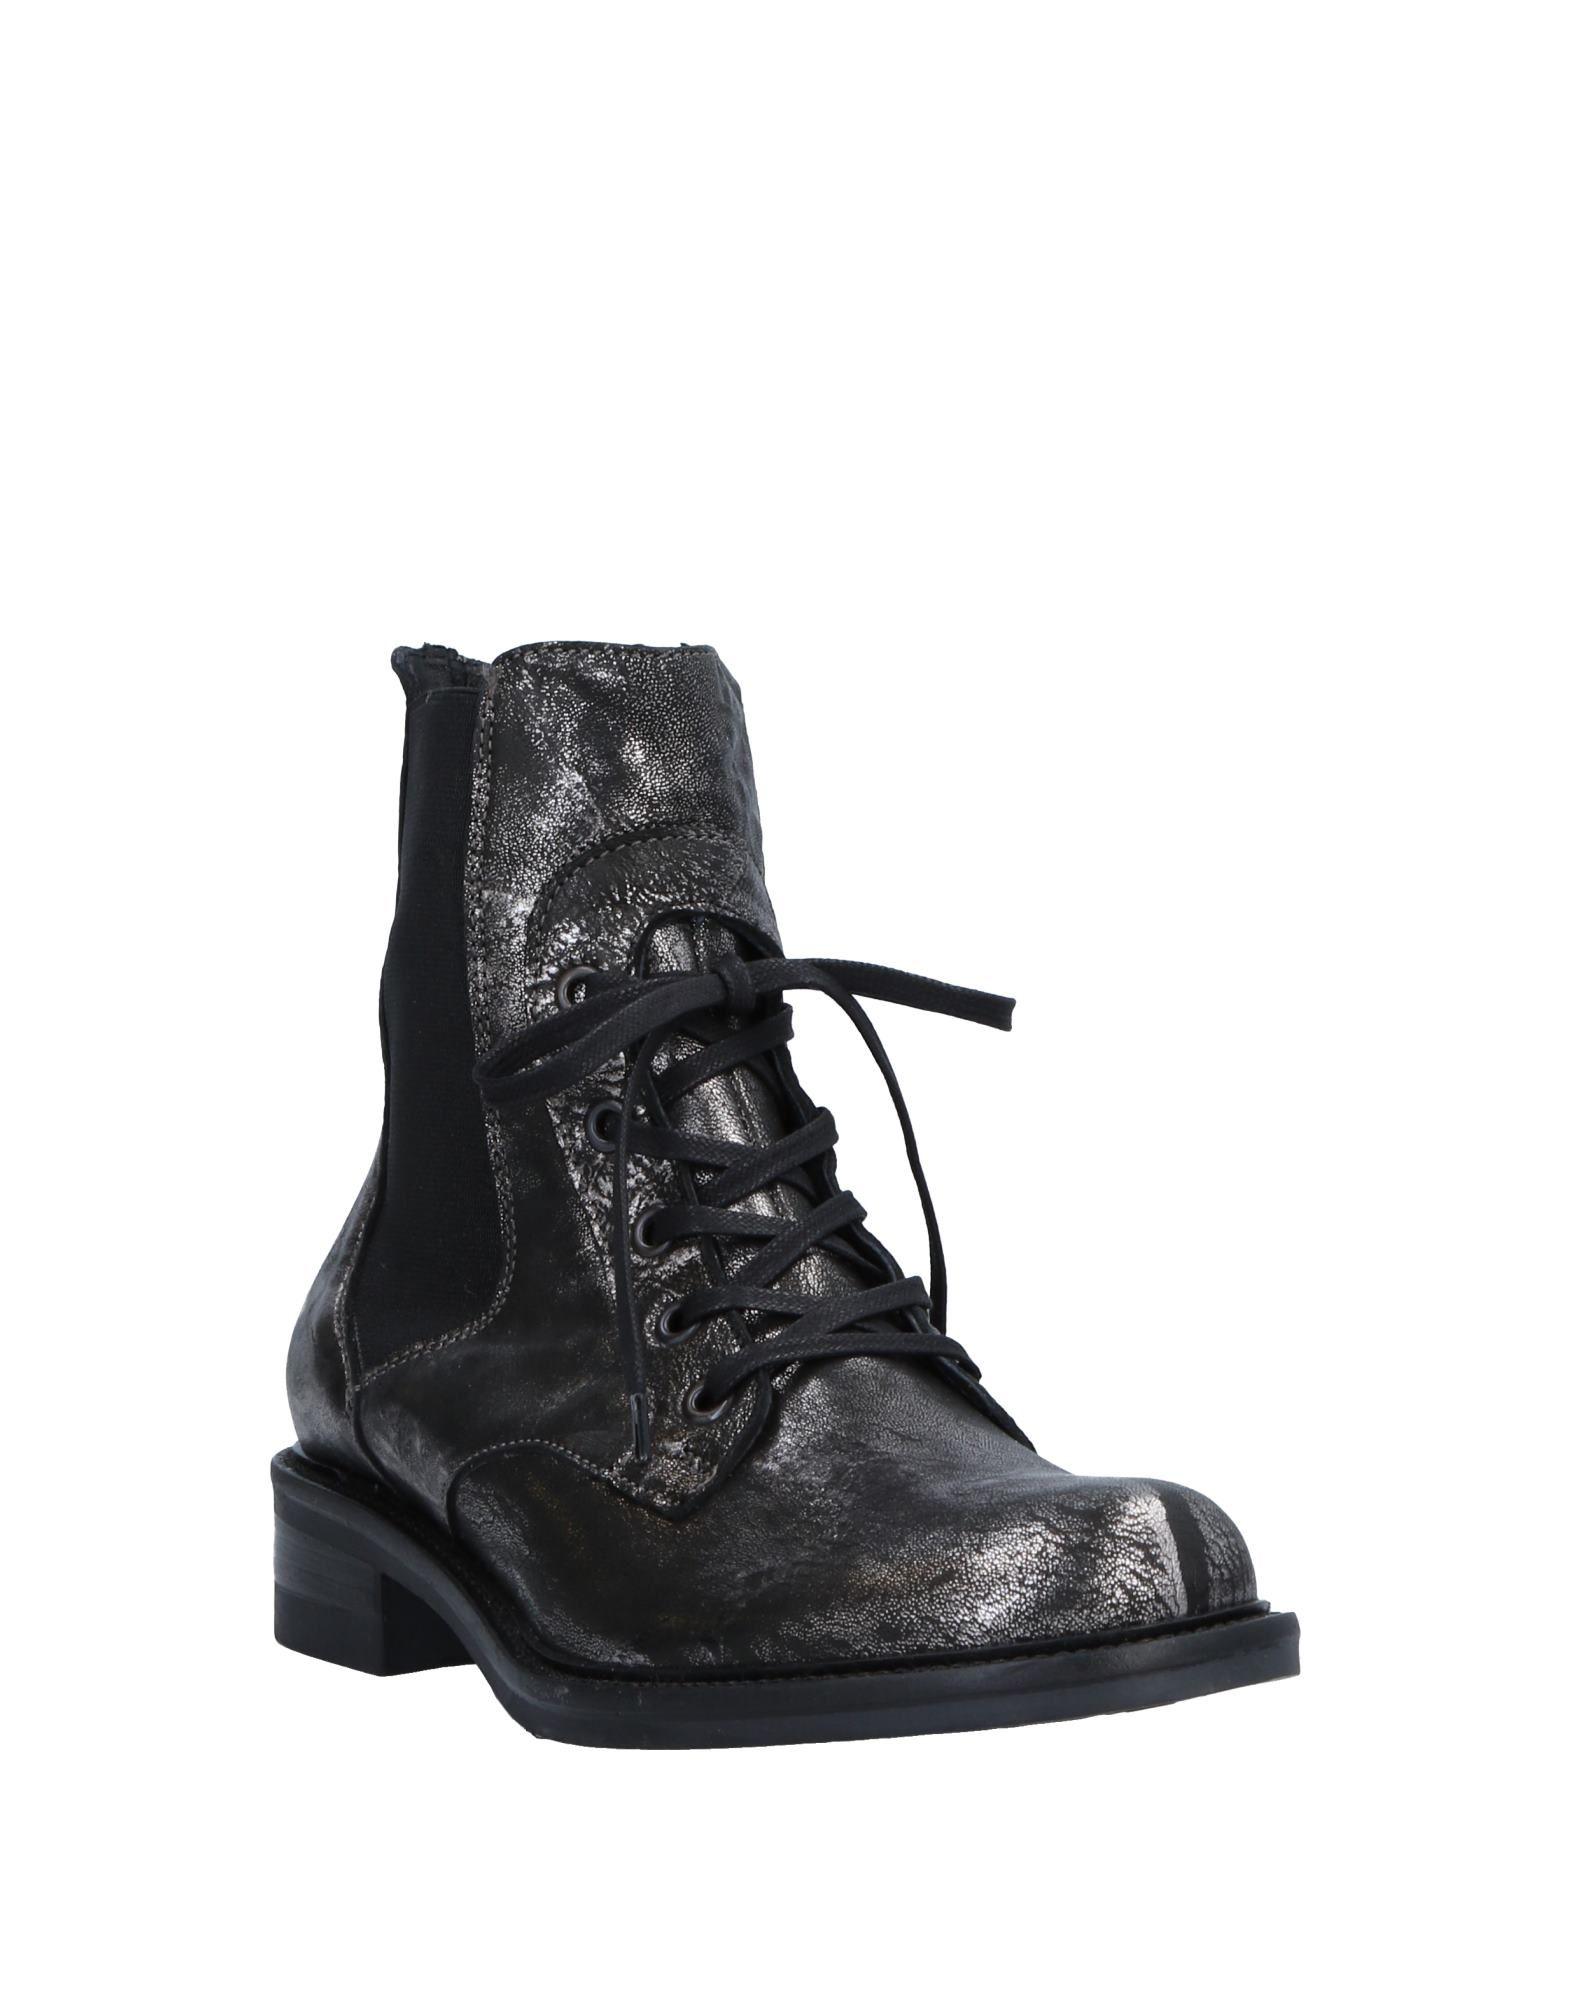 Donna Più Schuhe Stiefelette Damen  11526944TM Gute Qualität beliebte Schuhe Più f6ef73